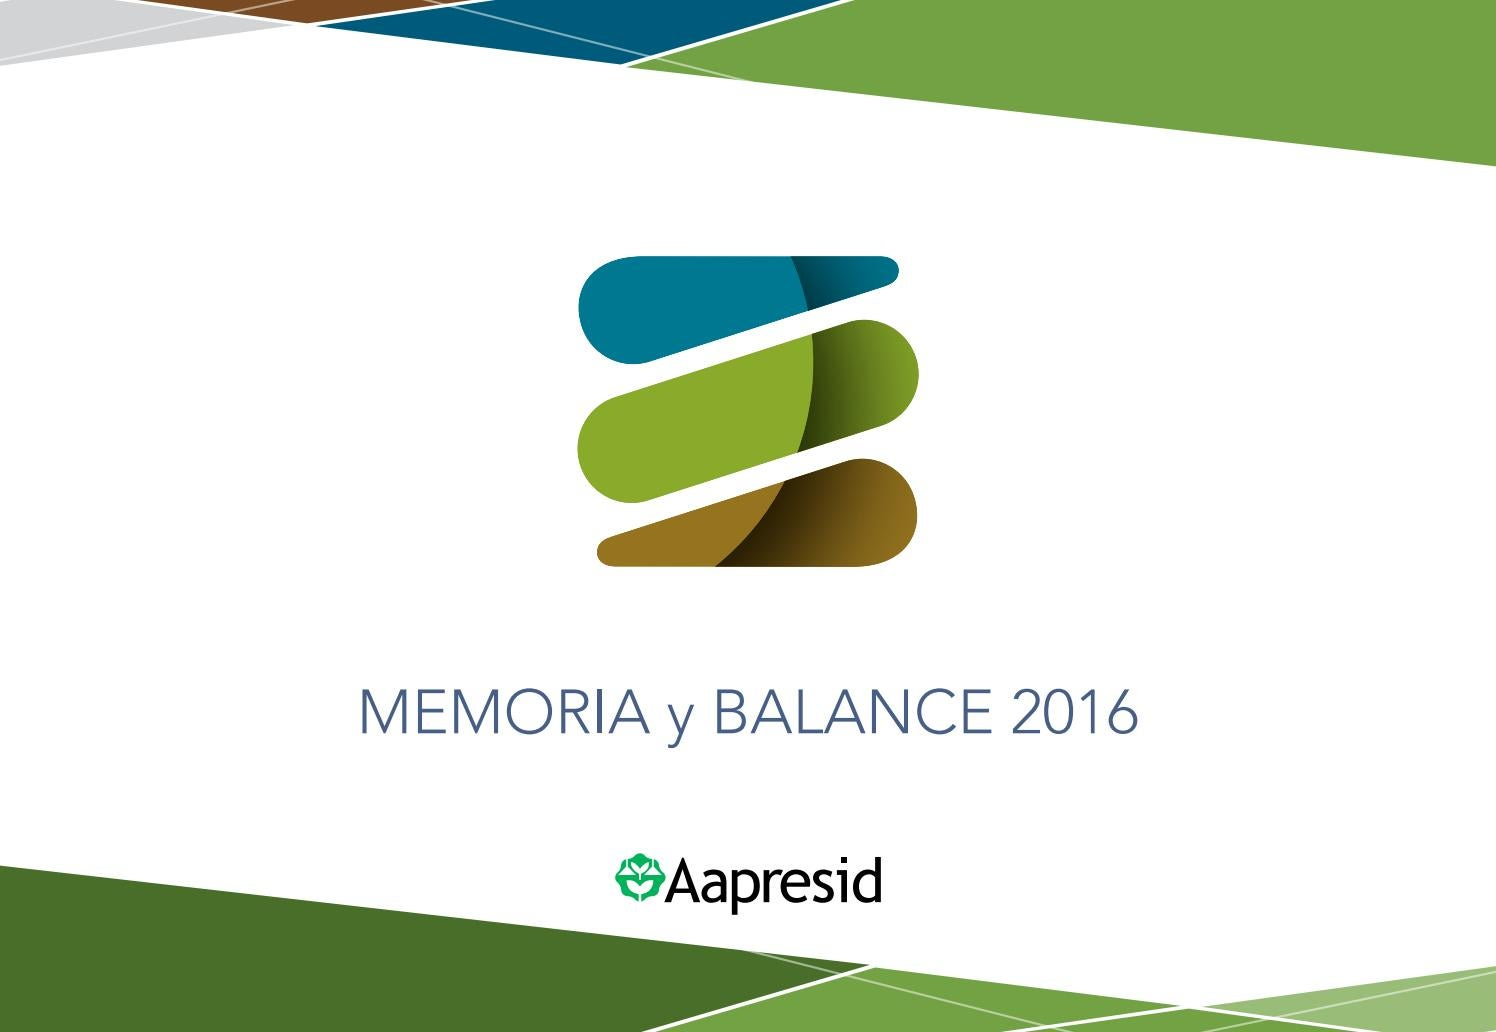 Memoria y balance 2016 by Aapresid Aapresid - issuu